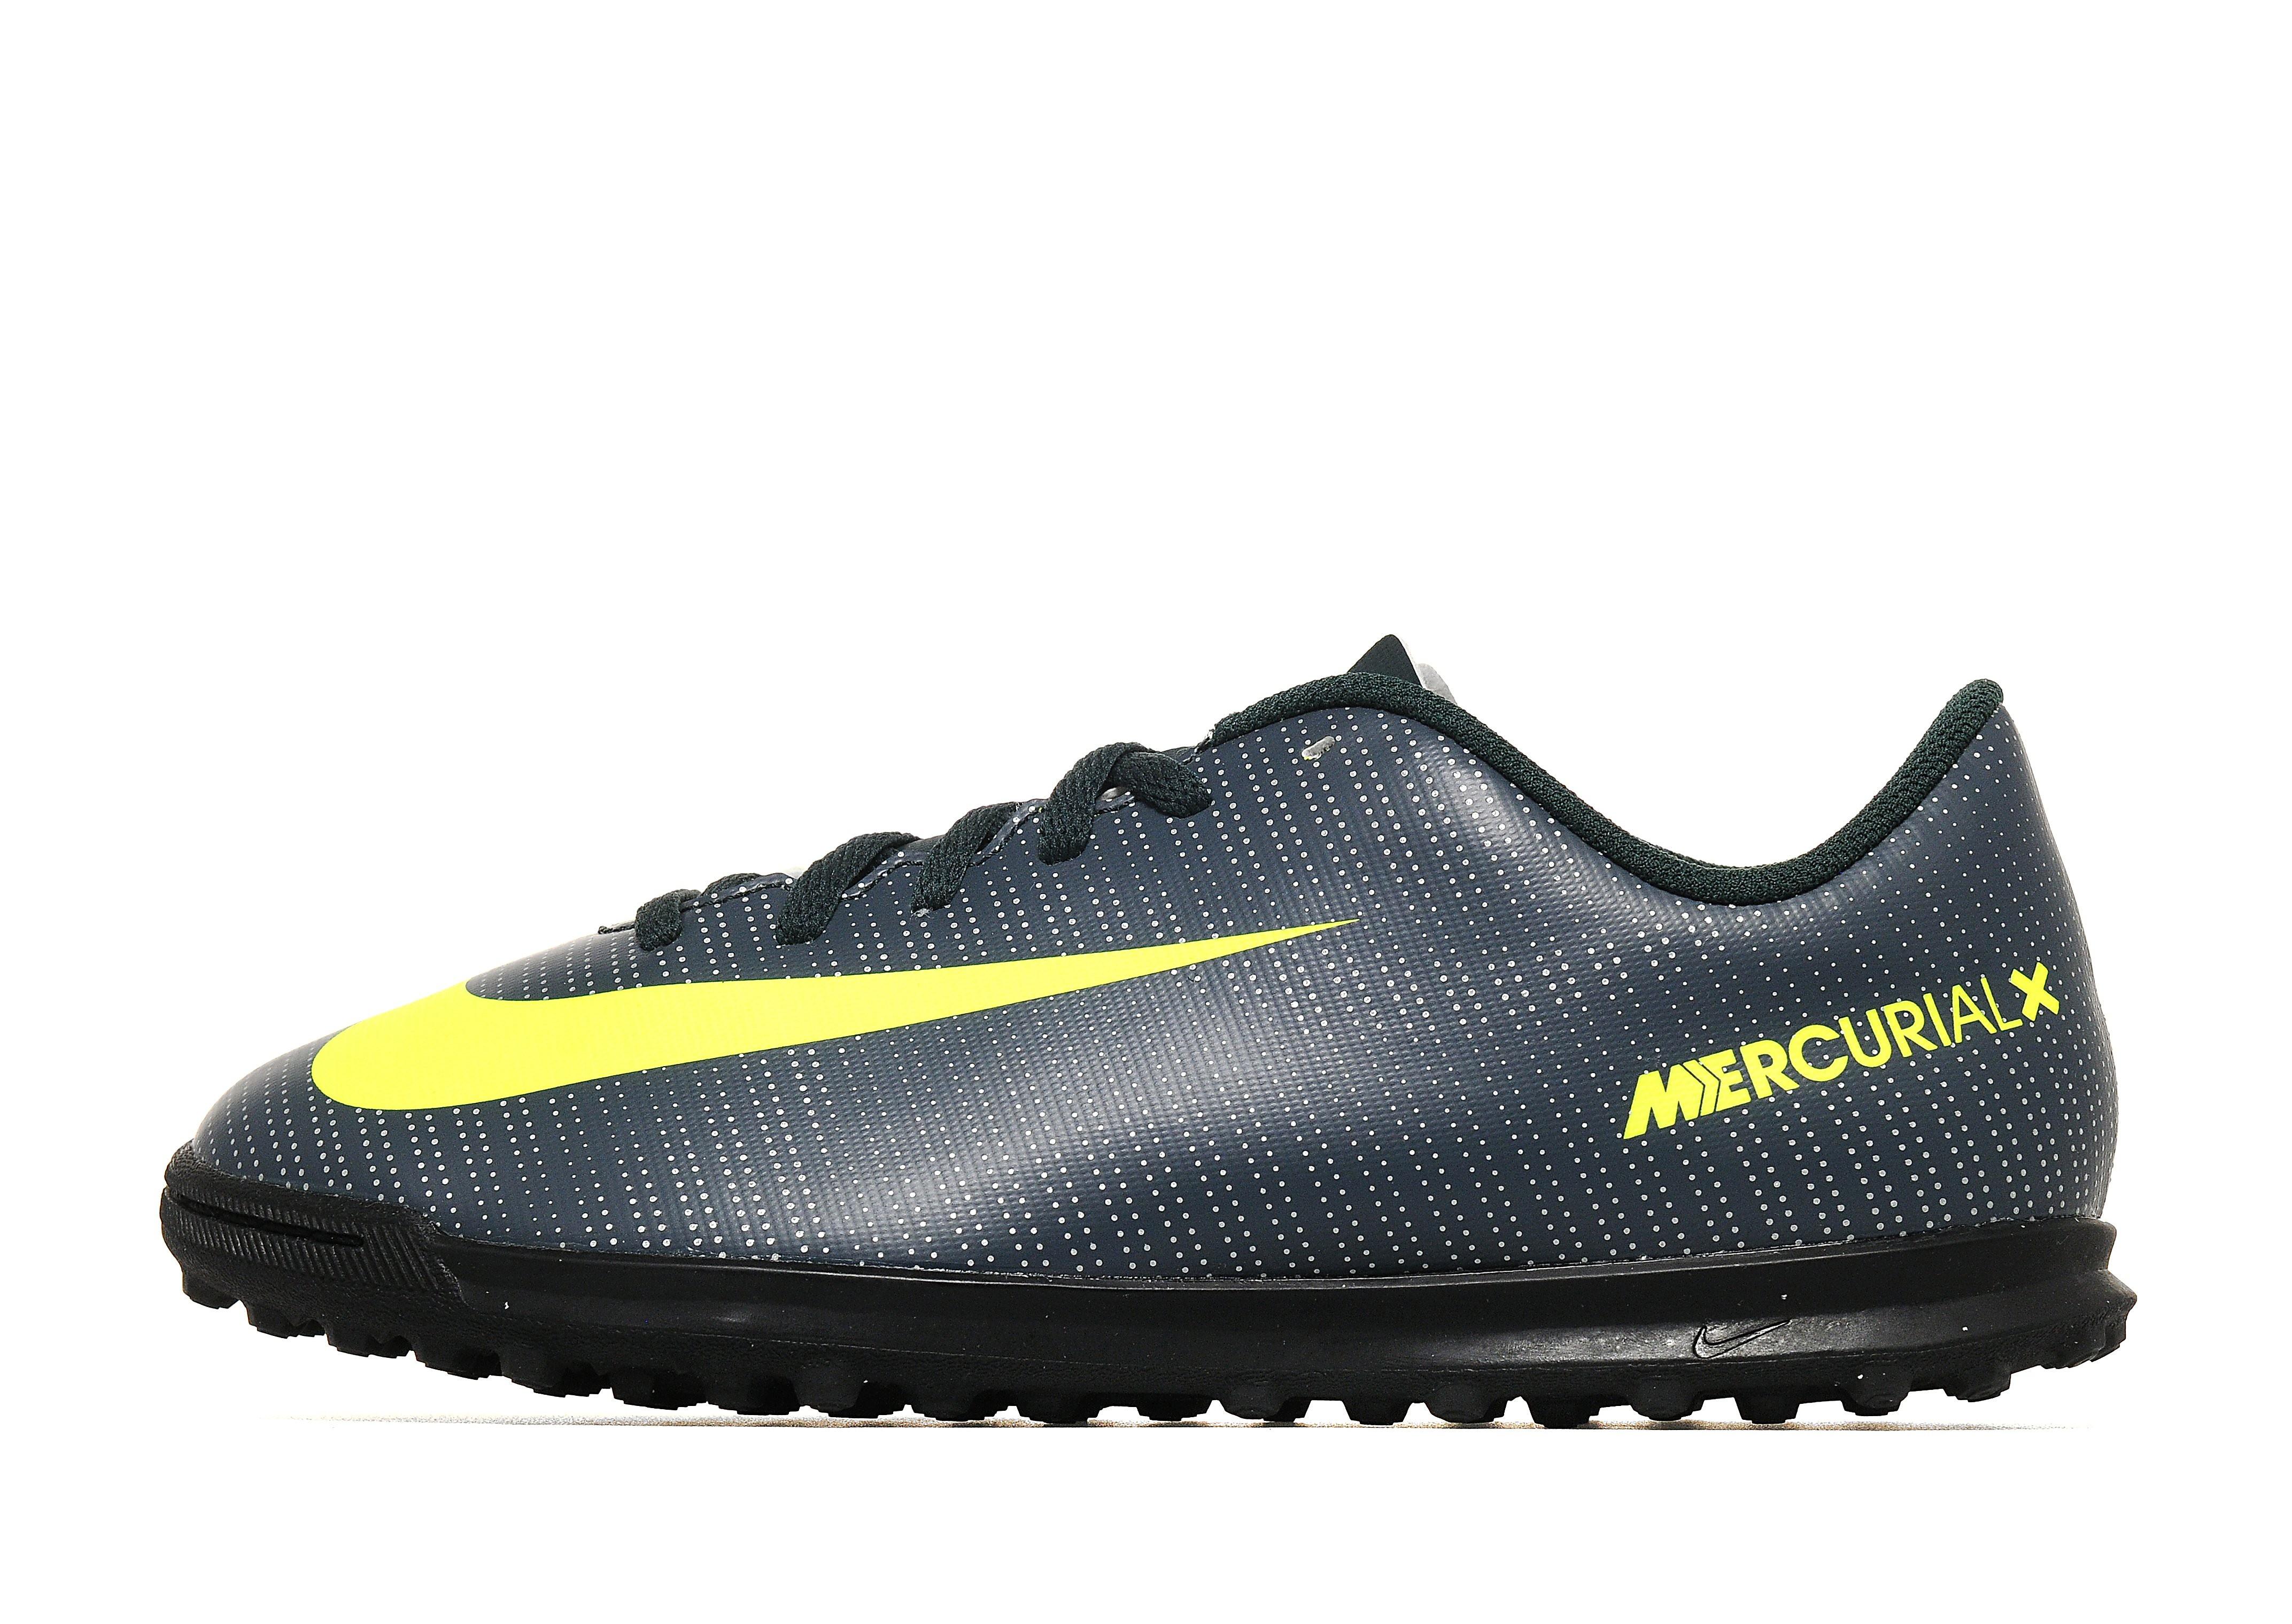 Nike Chapter 3 Mercurial Vortex III CR7 Turf Junior - Seaweed/Green - Kids  - Sports King Store